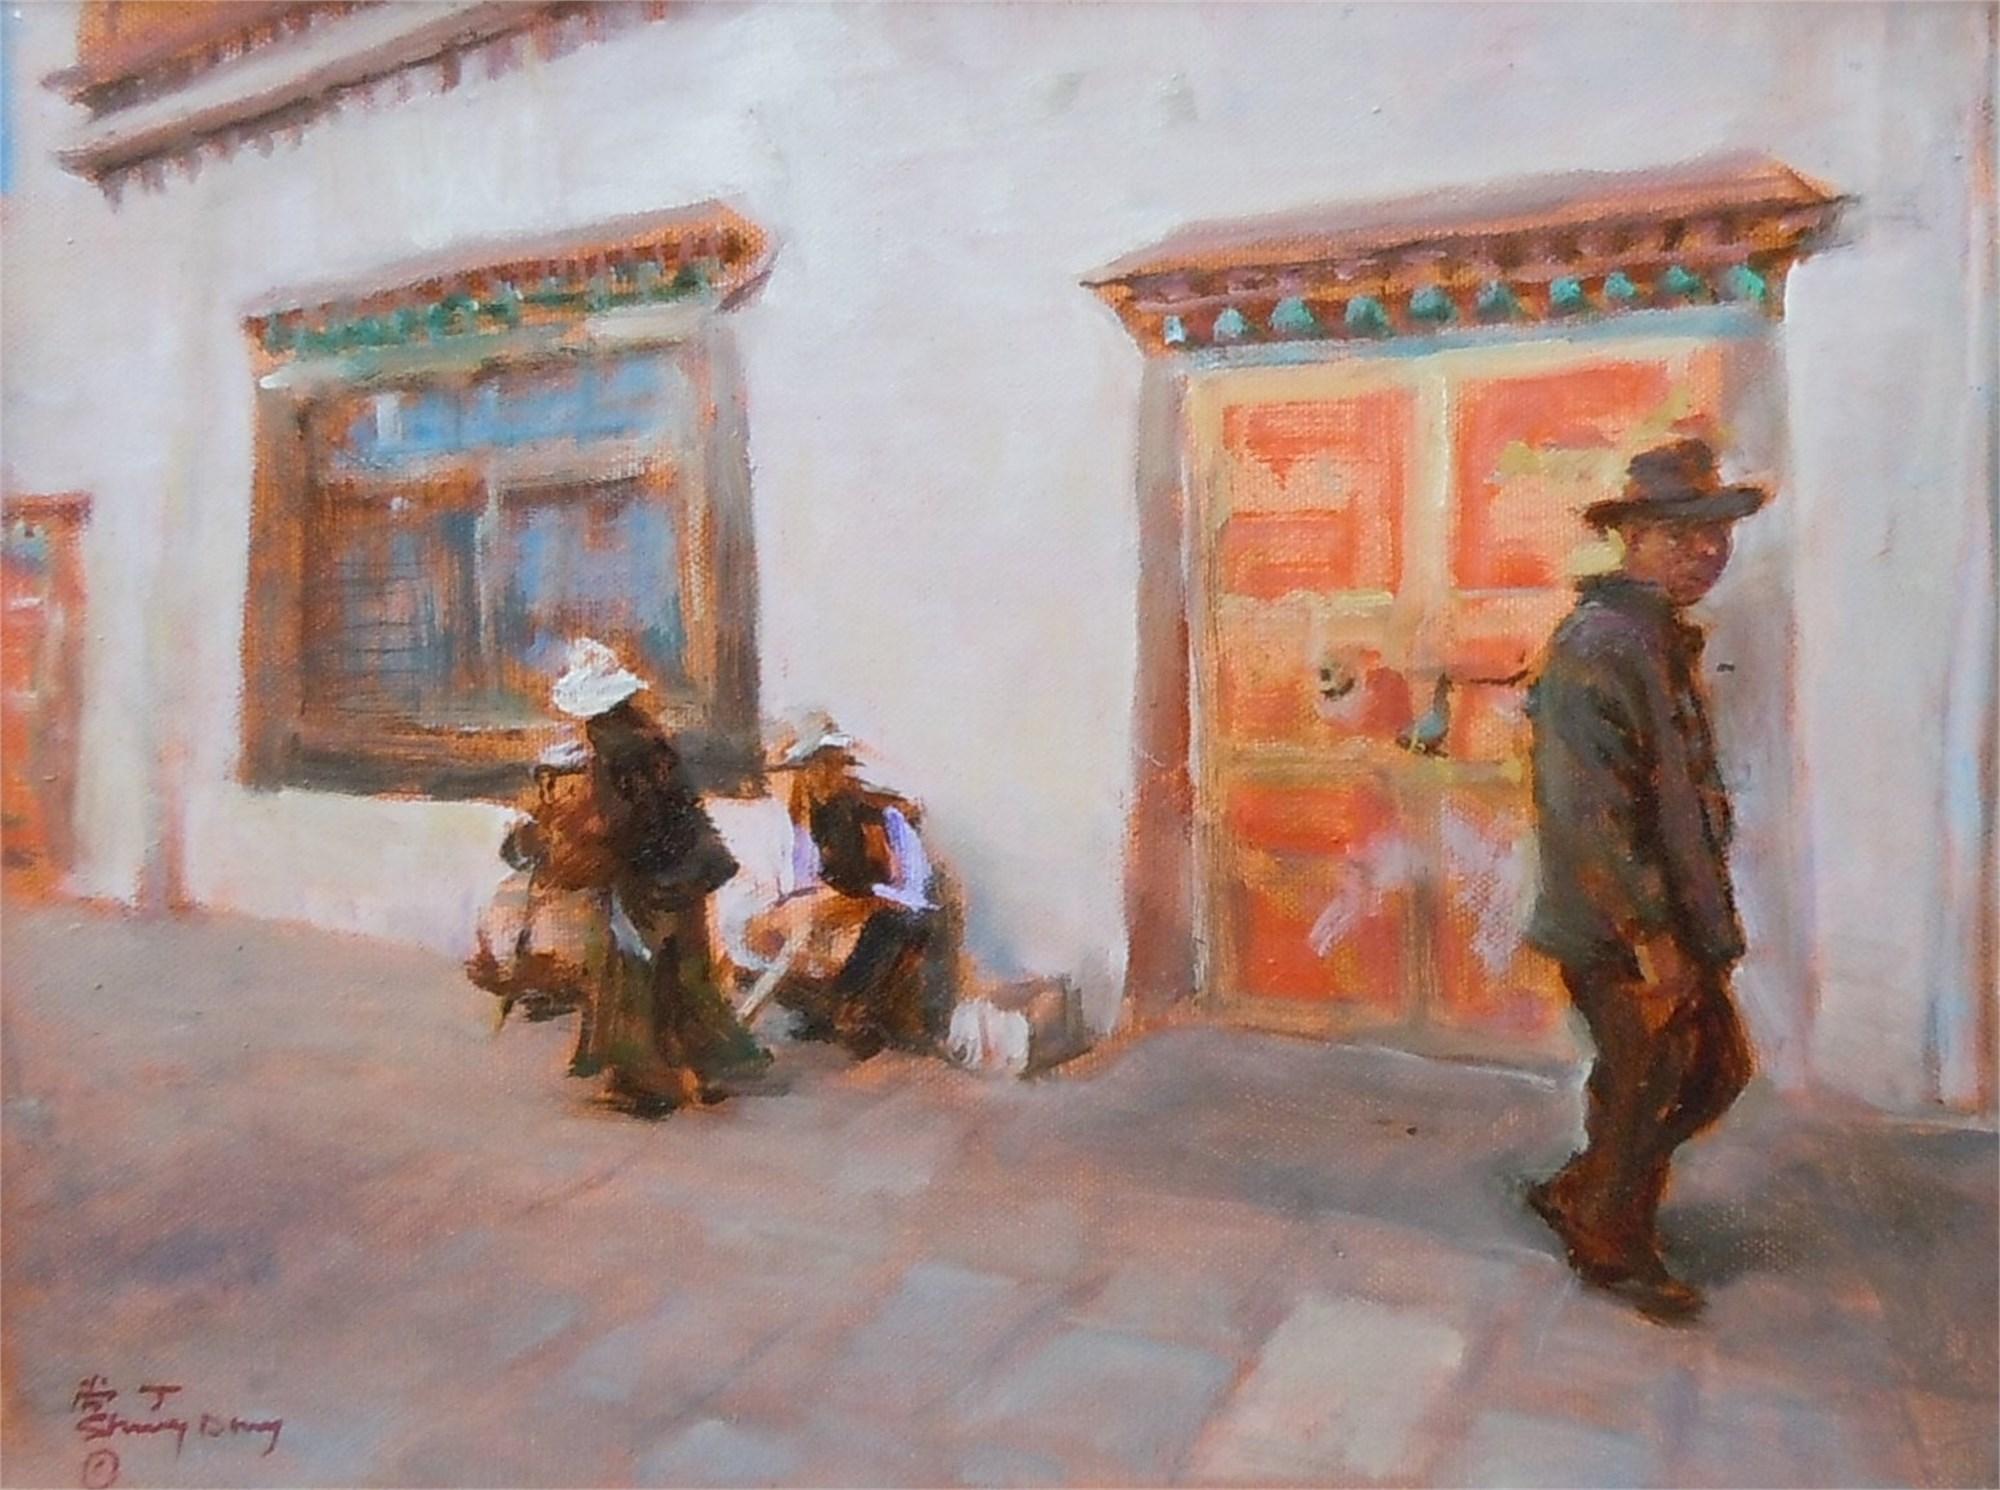 Tibetan Study 2 by Shang Ding